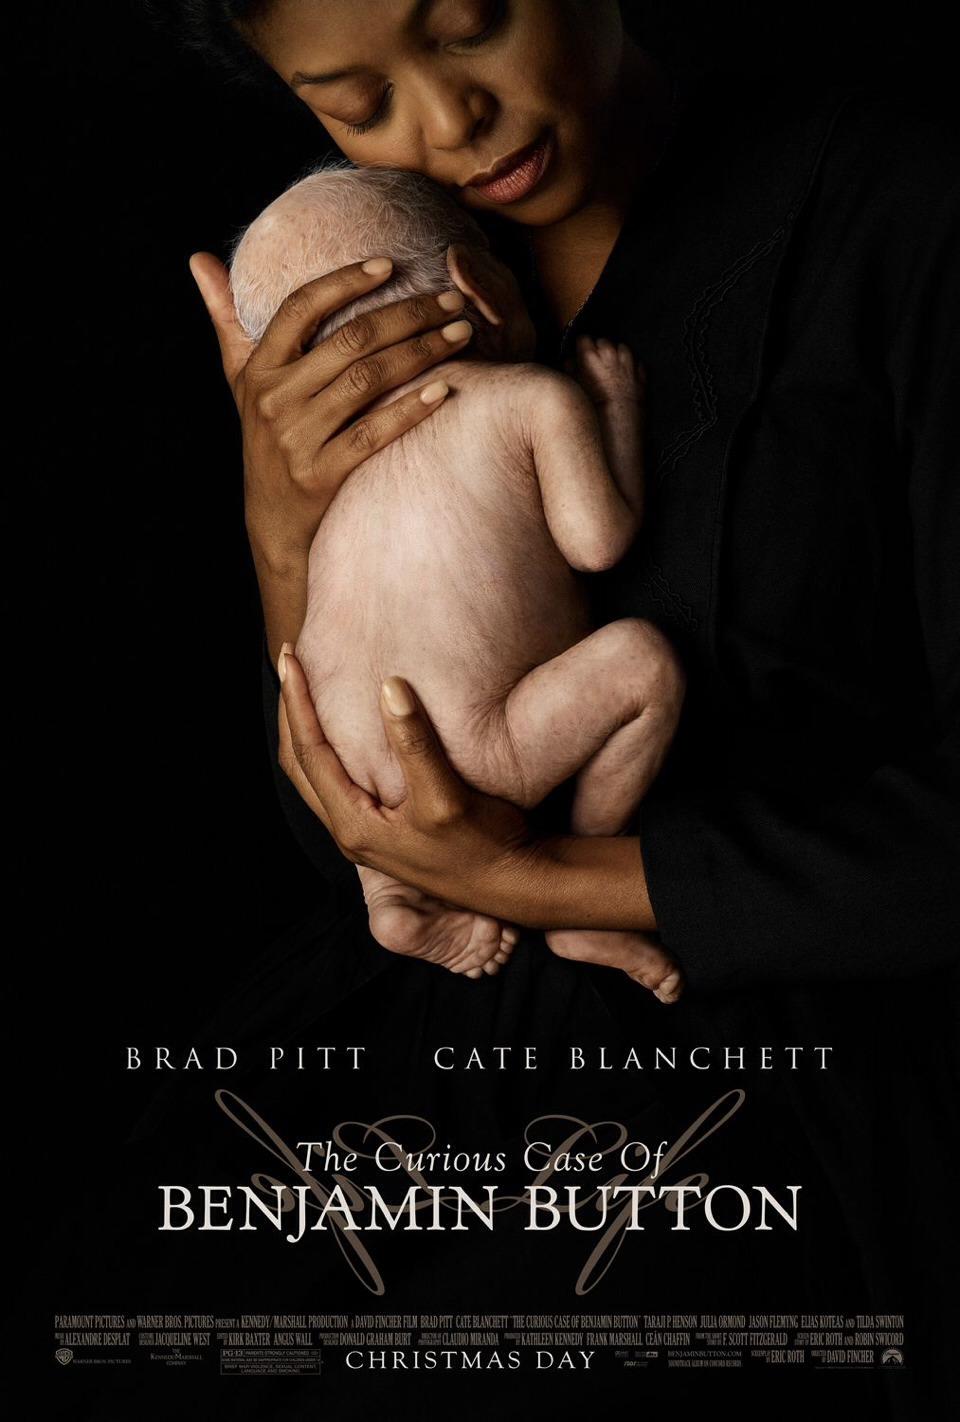 CURIOUS CASE OF BENJAMIN BUTTON - drama/romance